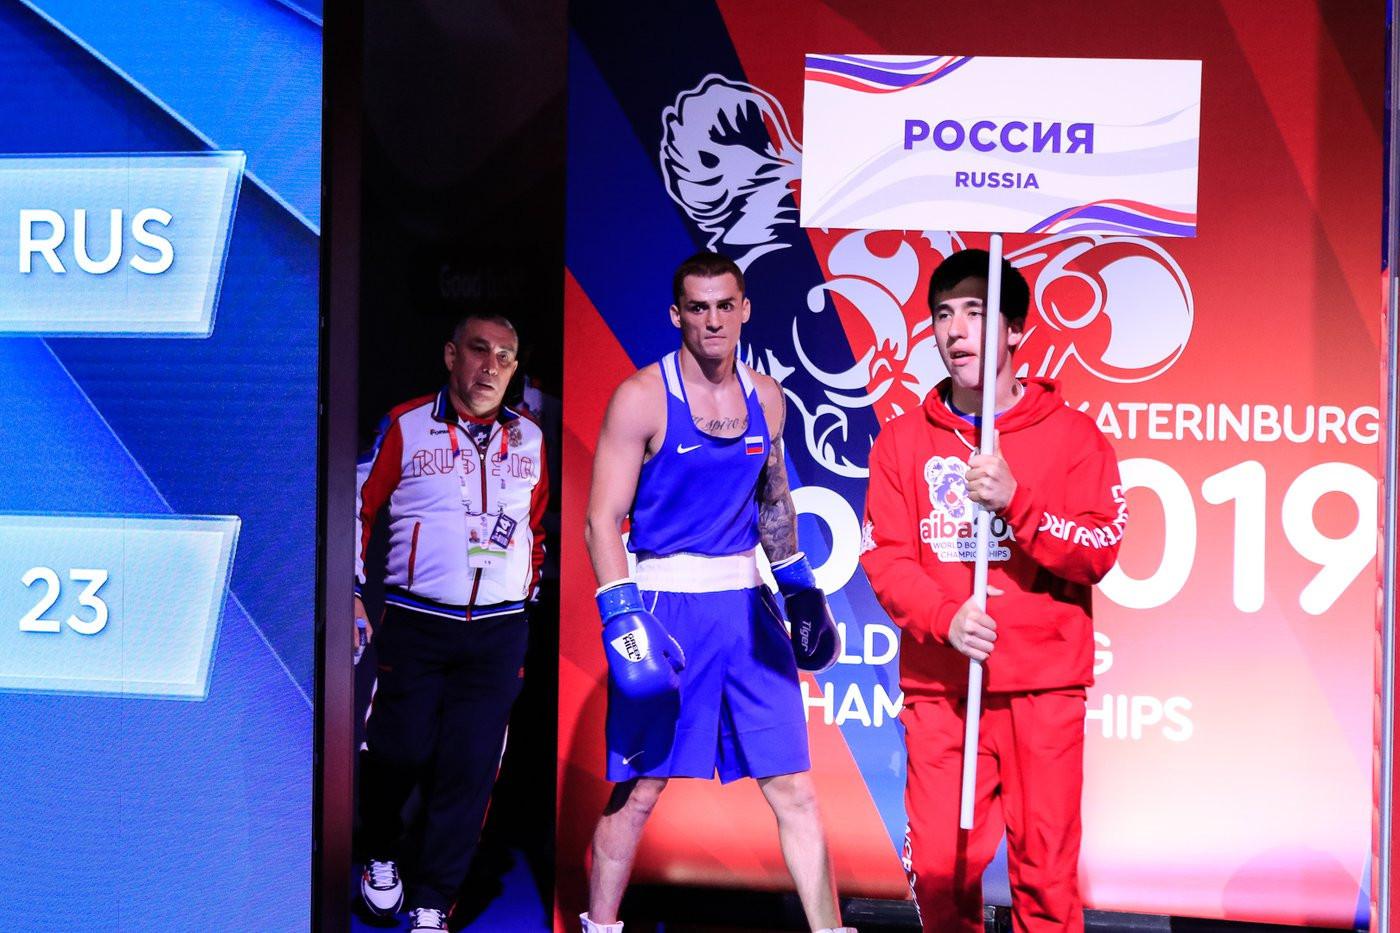 Gleb Bakshi had a middleweight bout against Amin Kushkhov of Azerbaijan ©Yekaterinburg 2019